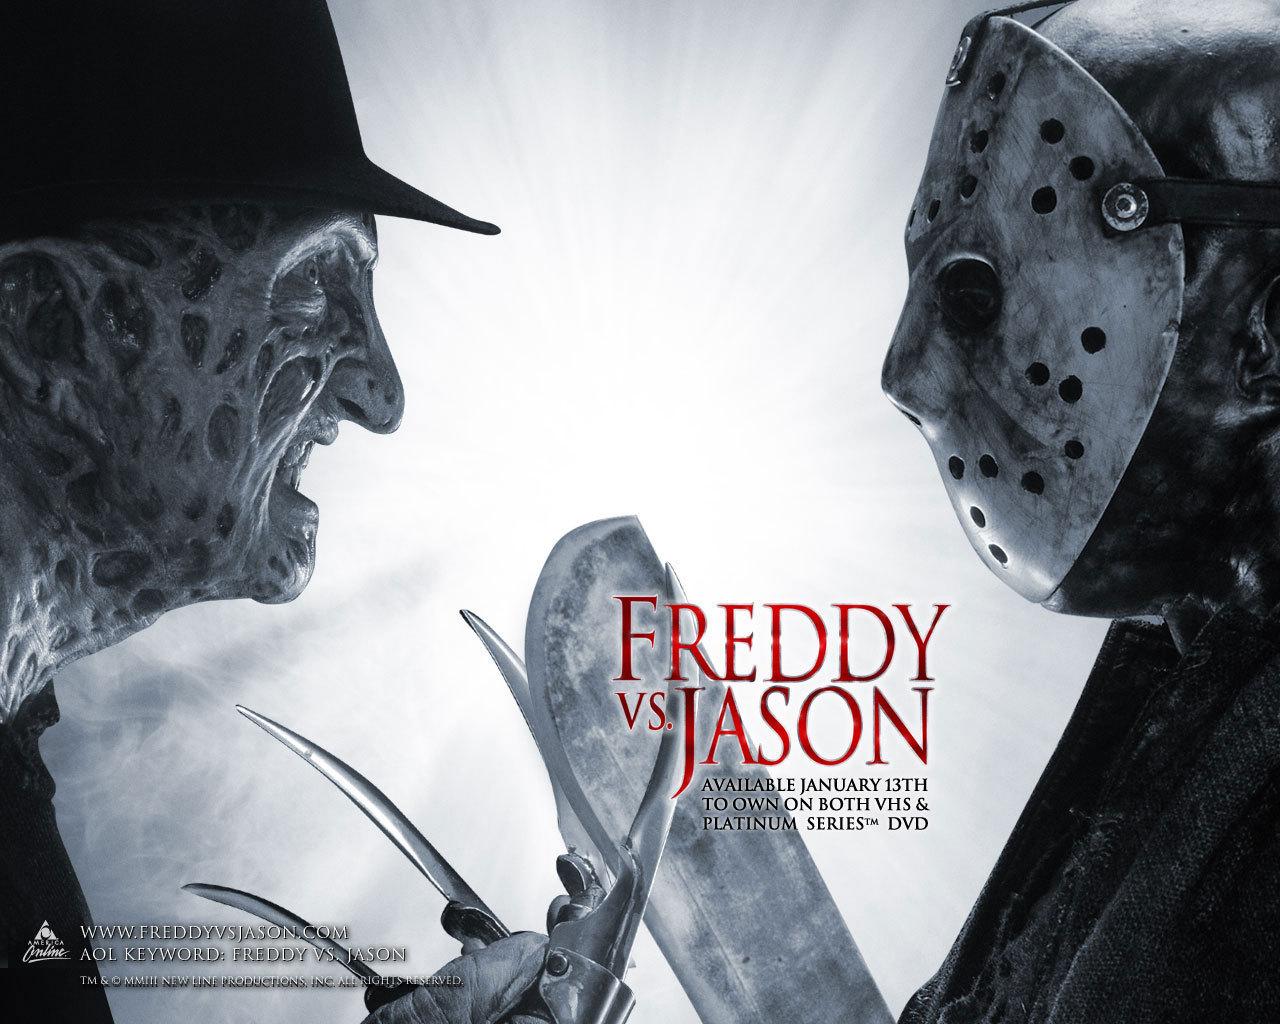 http://3.bp.blogspot.com/-AZmcwdEHY2k/Tc7A9cXPI3I/AAAAAAAAAQs/vuSQHp5MrJI/s1600/Freddy-vs-Jason.jpg